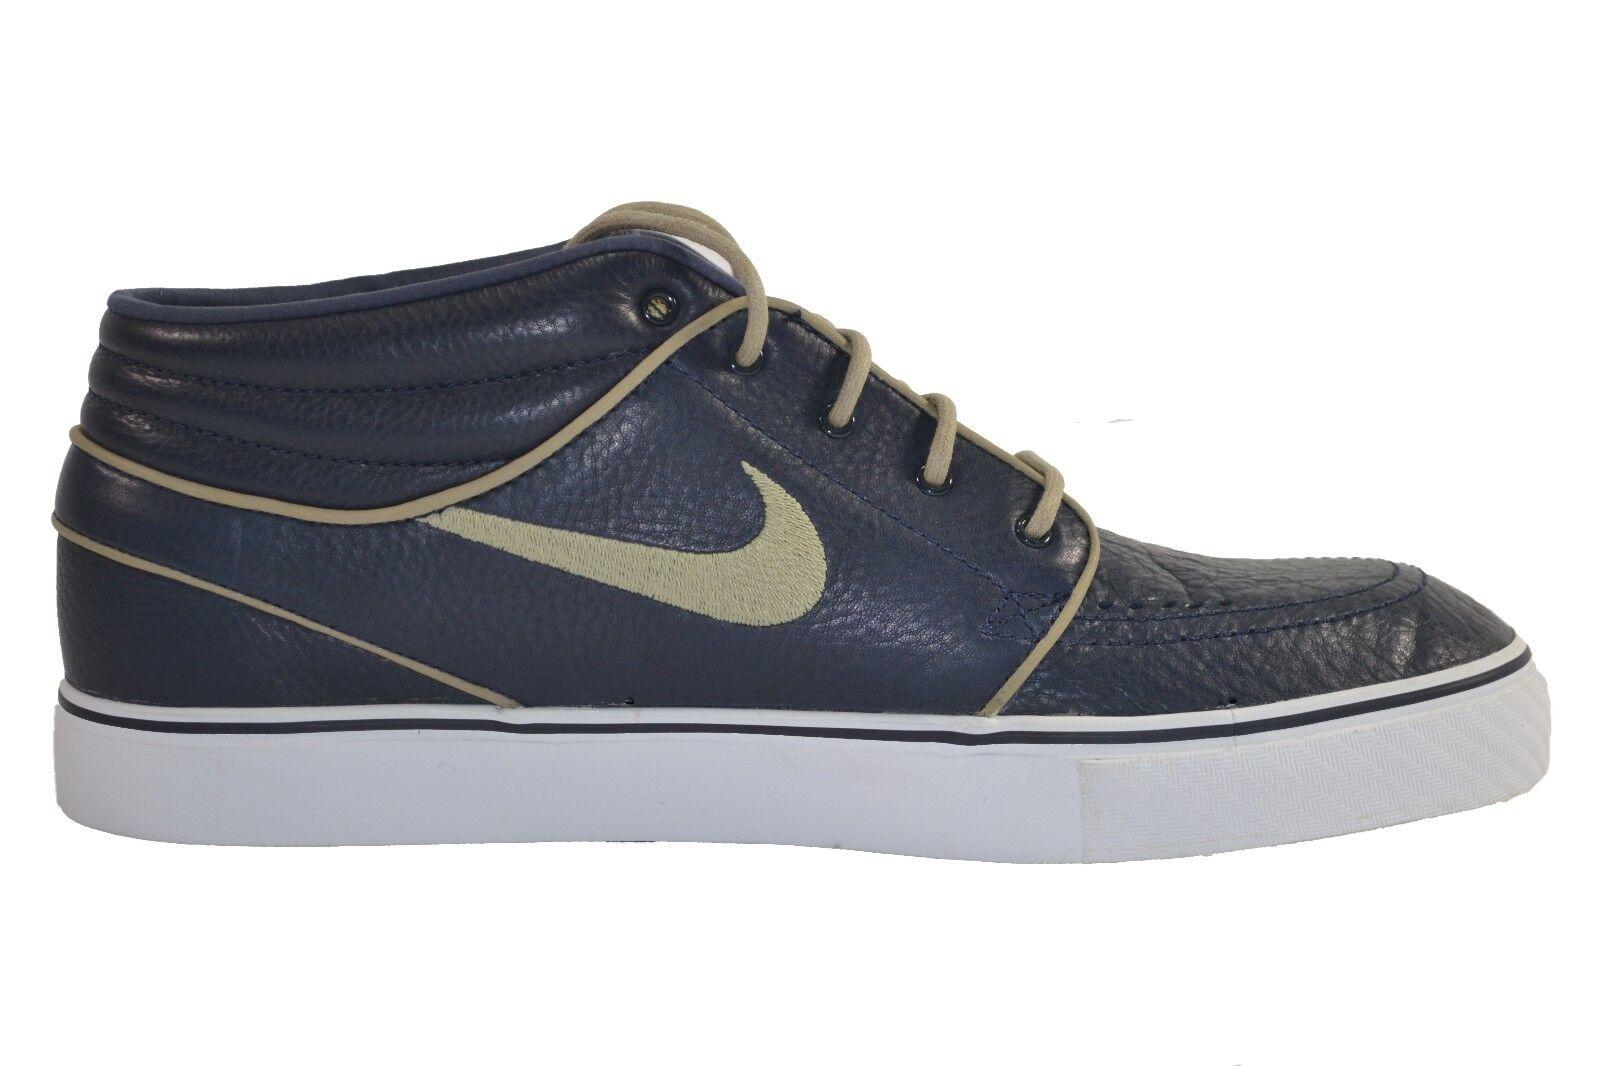 Nike Zoom Stefan Khaki Janoski MD PR Marine Khaki Stefan Gum precio de descuento reducción zapatos de hombre c852a1